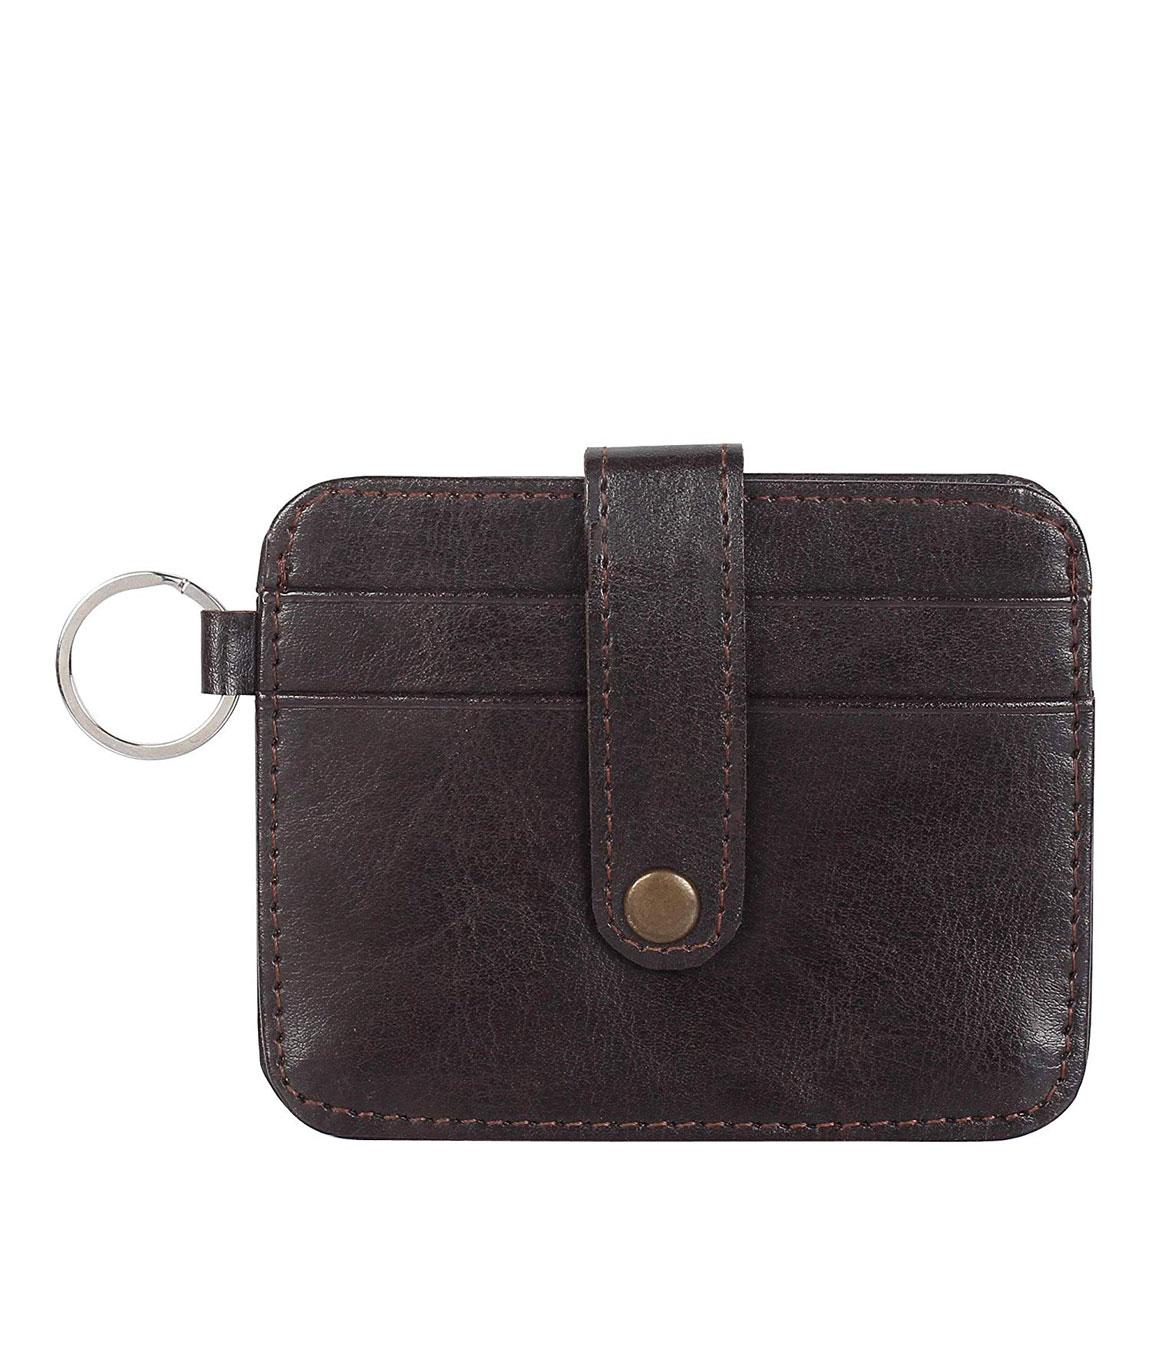 ZORO Credit Debit case Wallet, Mens Wallet Card case